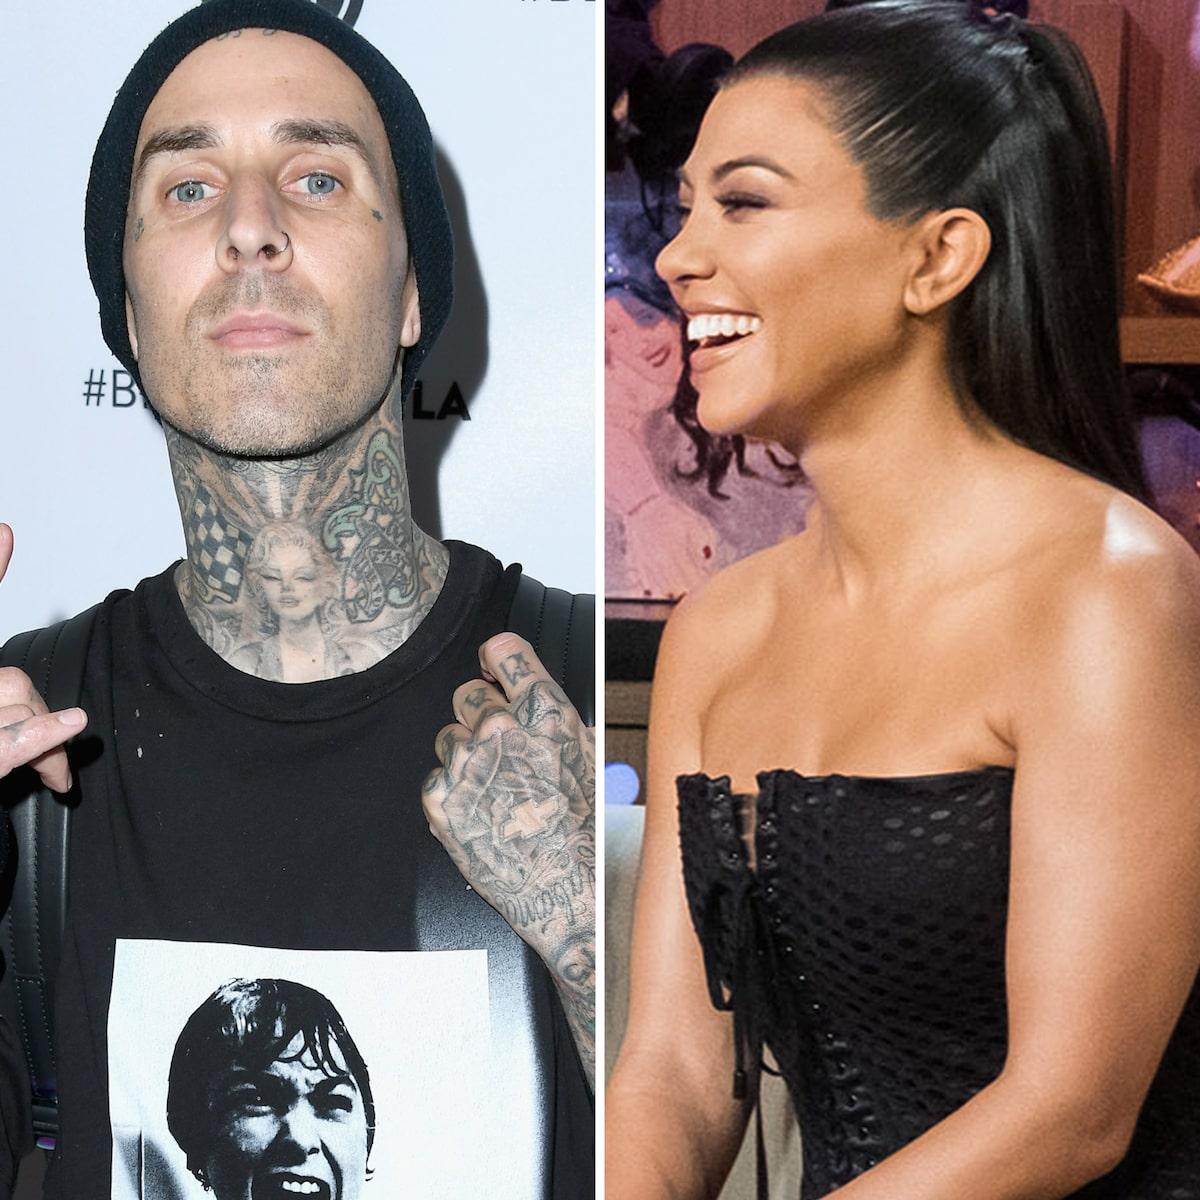 kuwtk-kourtney-kardashian-reportedly-really-likes-travis-barker-inside-their-relationship